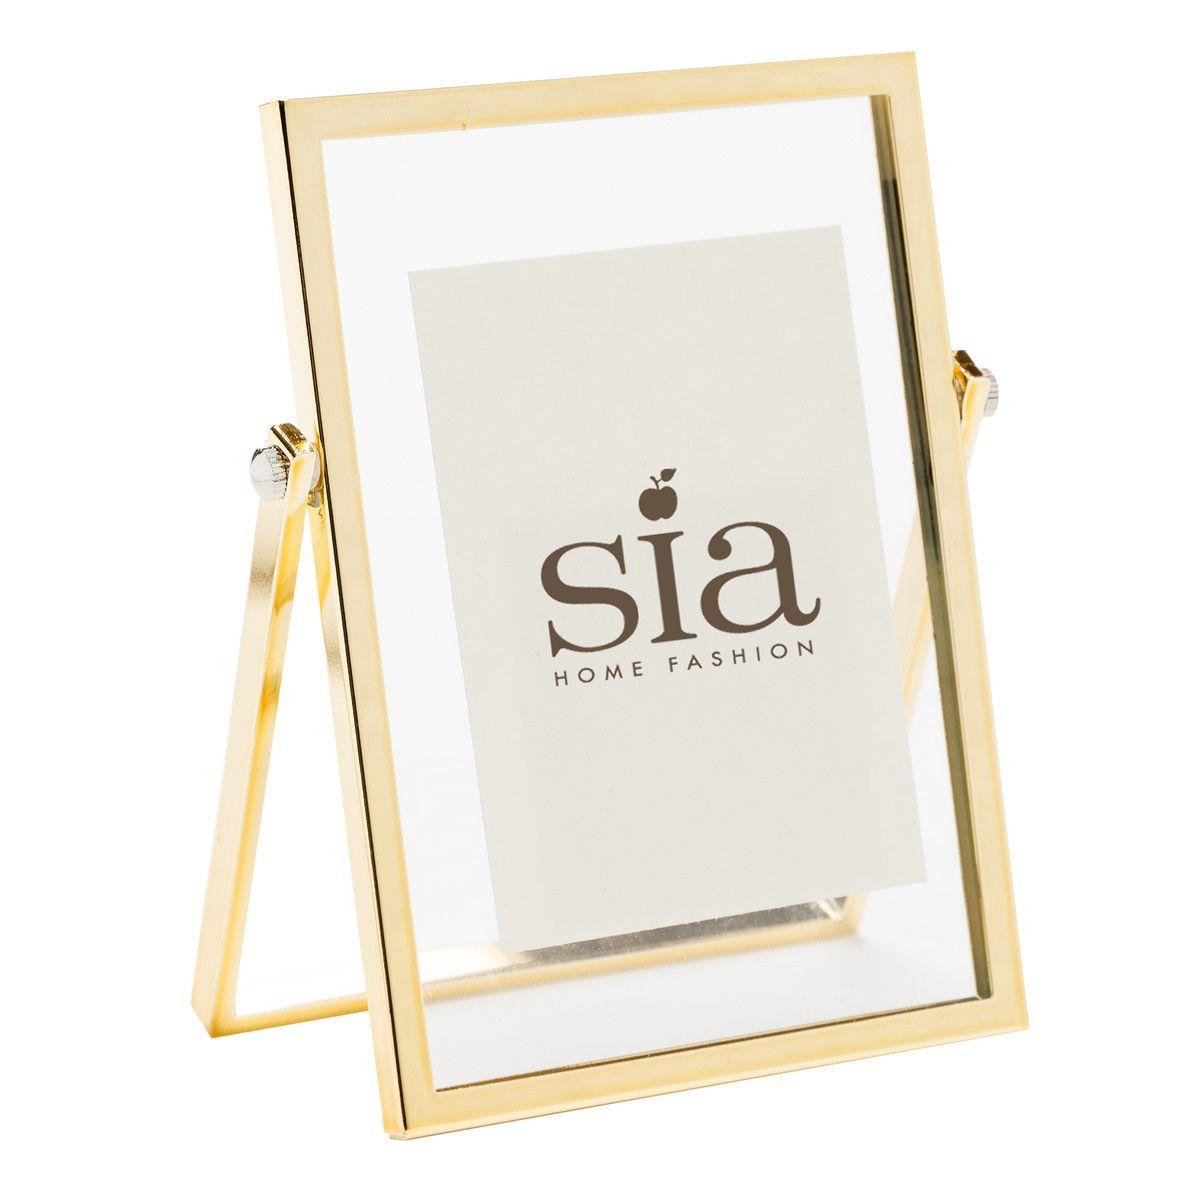 Cornice Sia Home Fashion.Easel Cornice 6x9cm Frames Cornice Frame House Styles